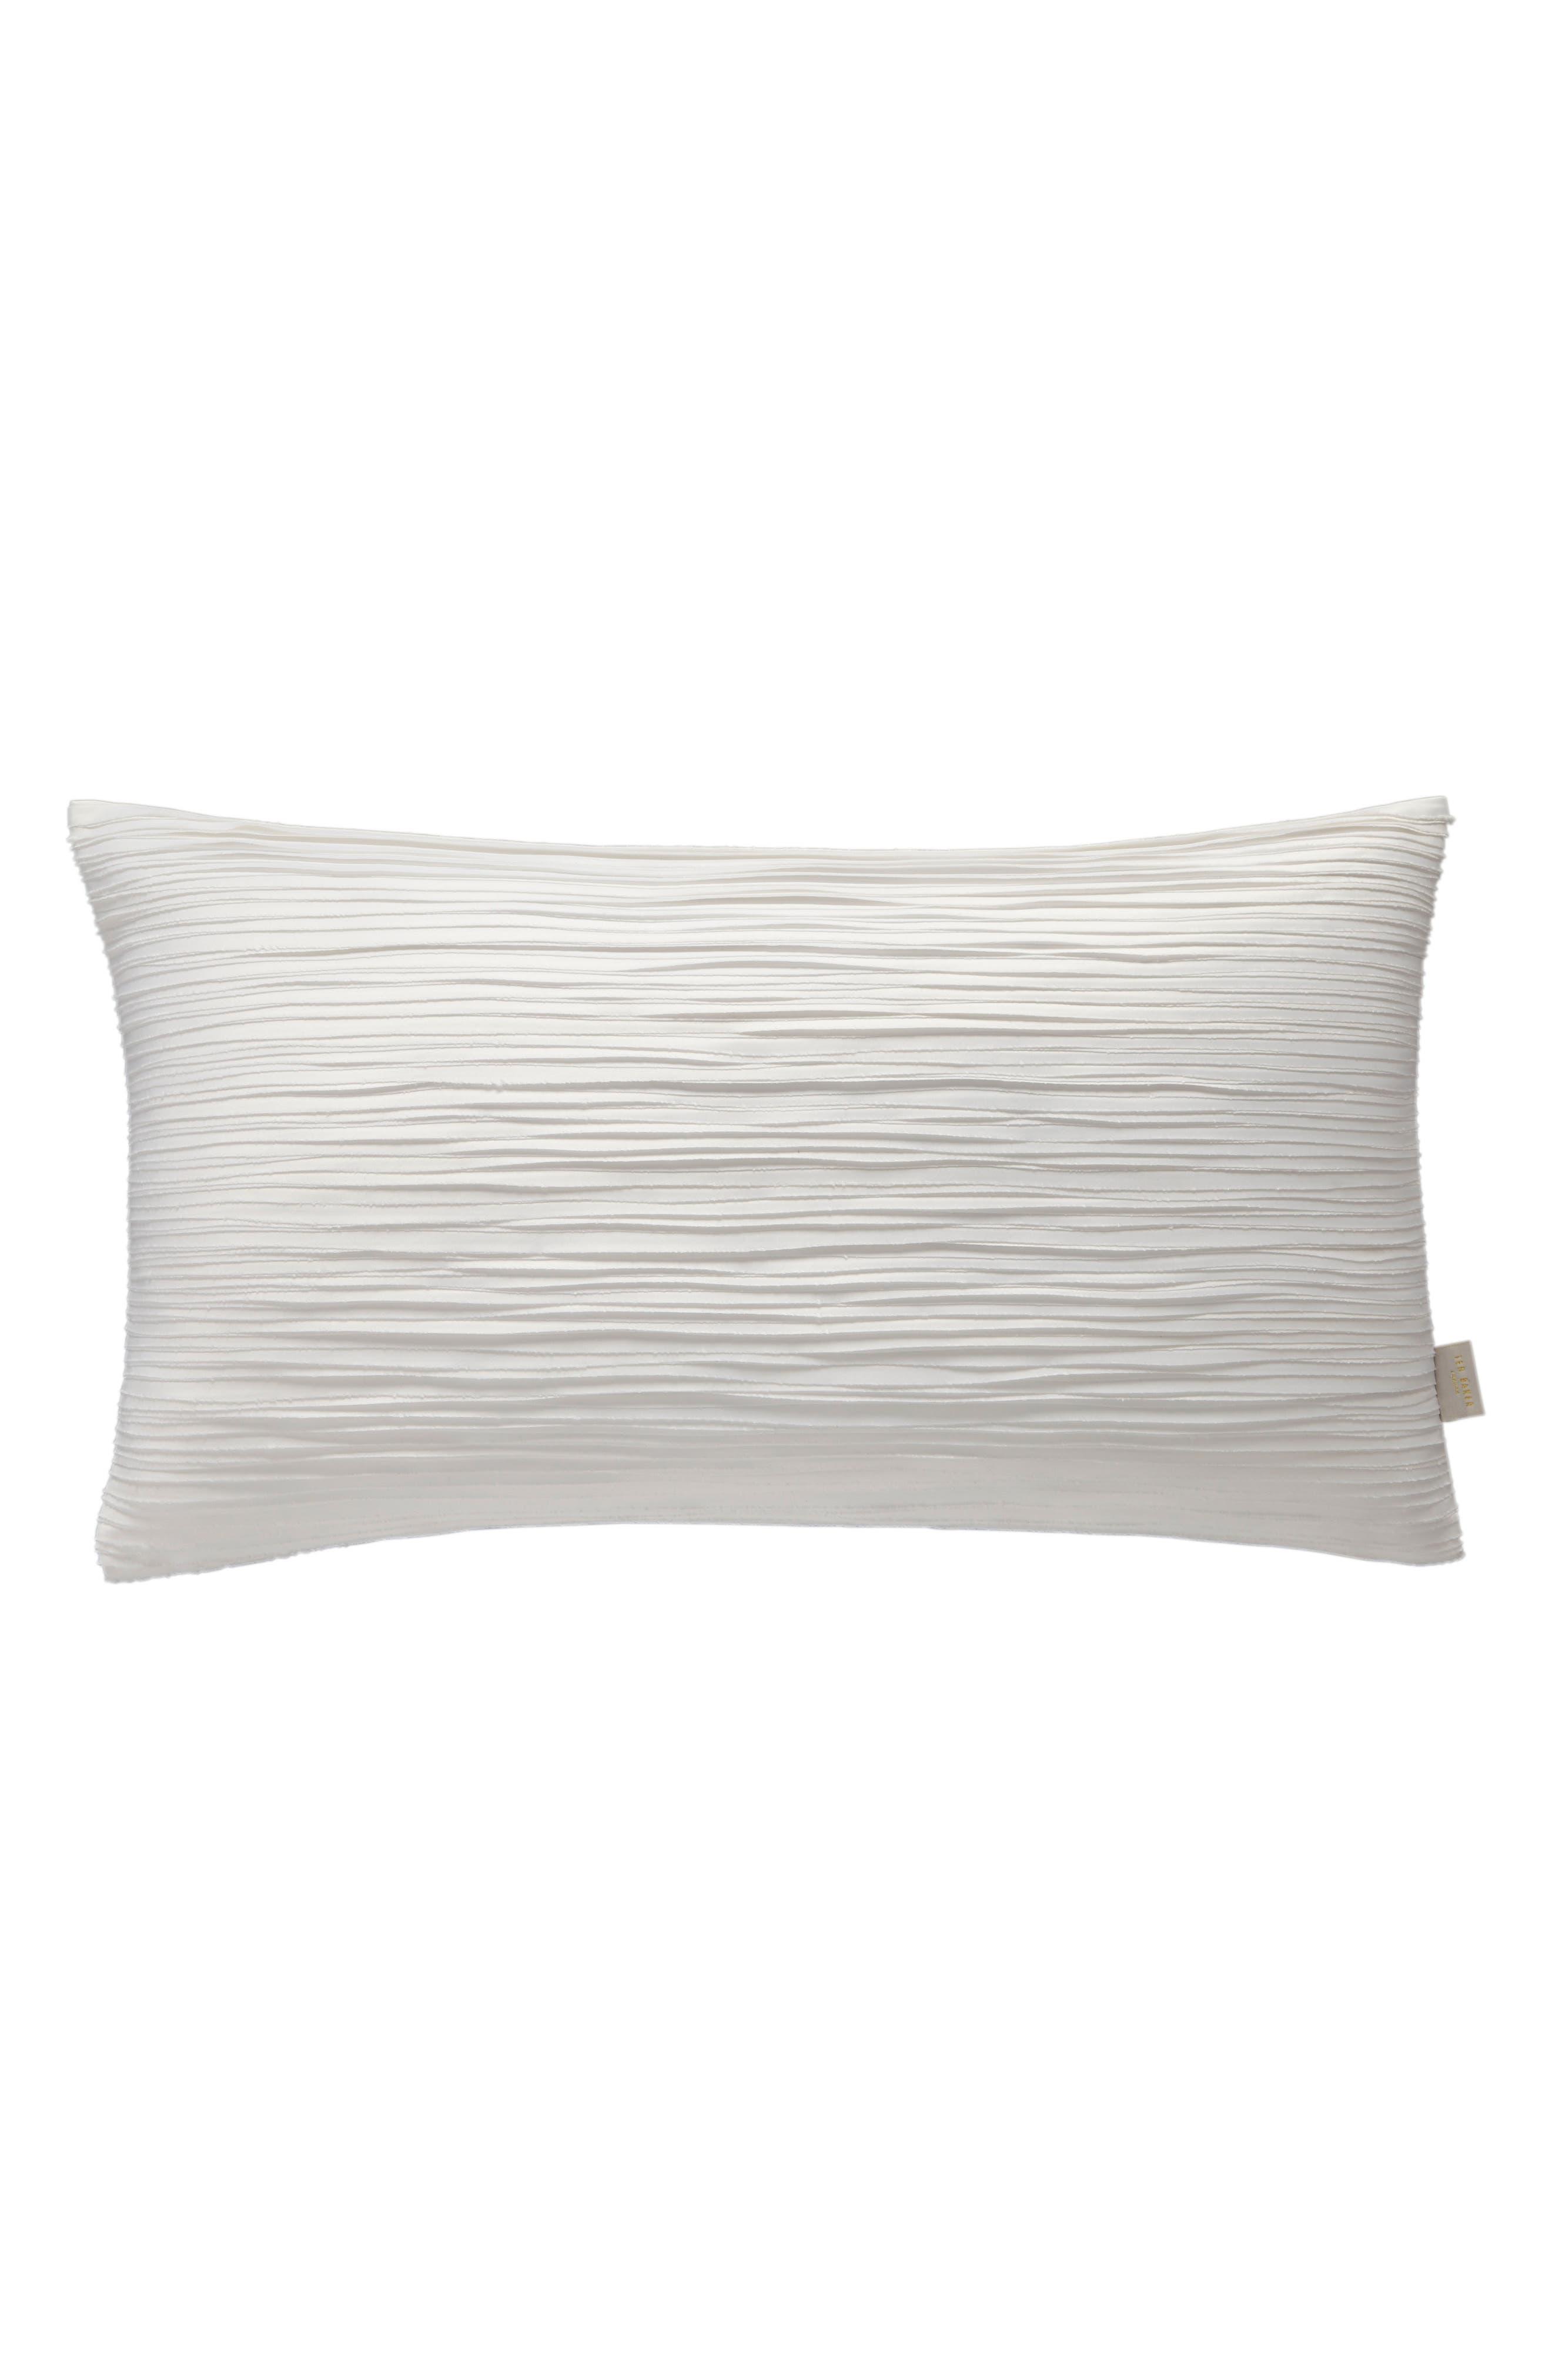 Versailles Comforter & Sham Set,                             Alternate thumbnail 10, color,                             White